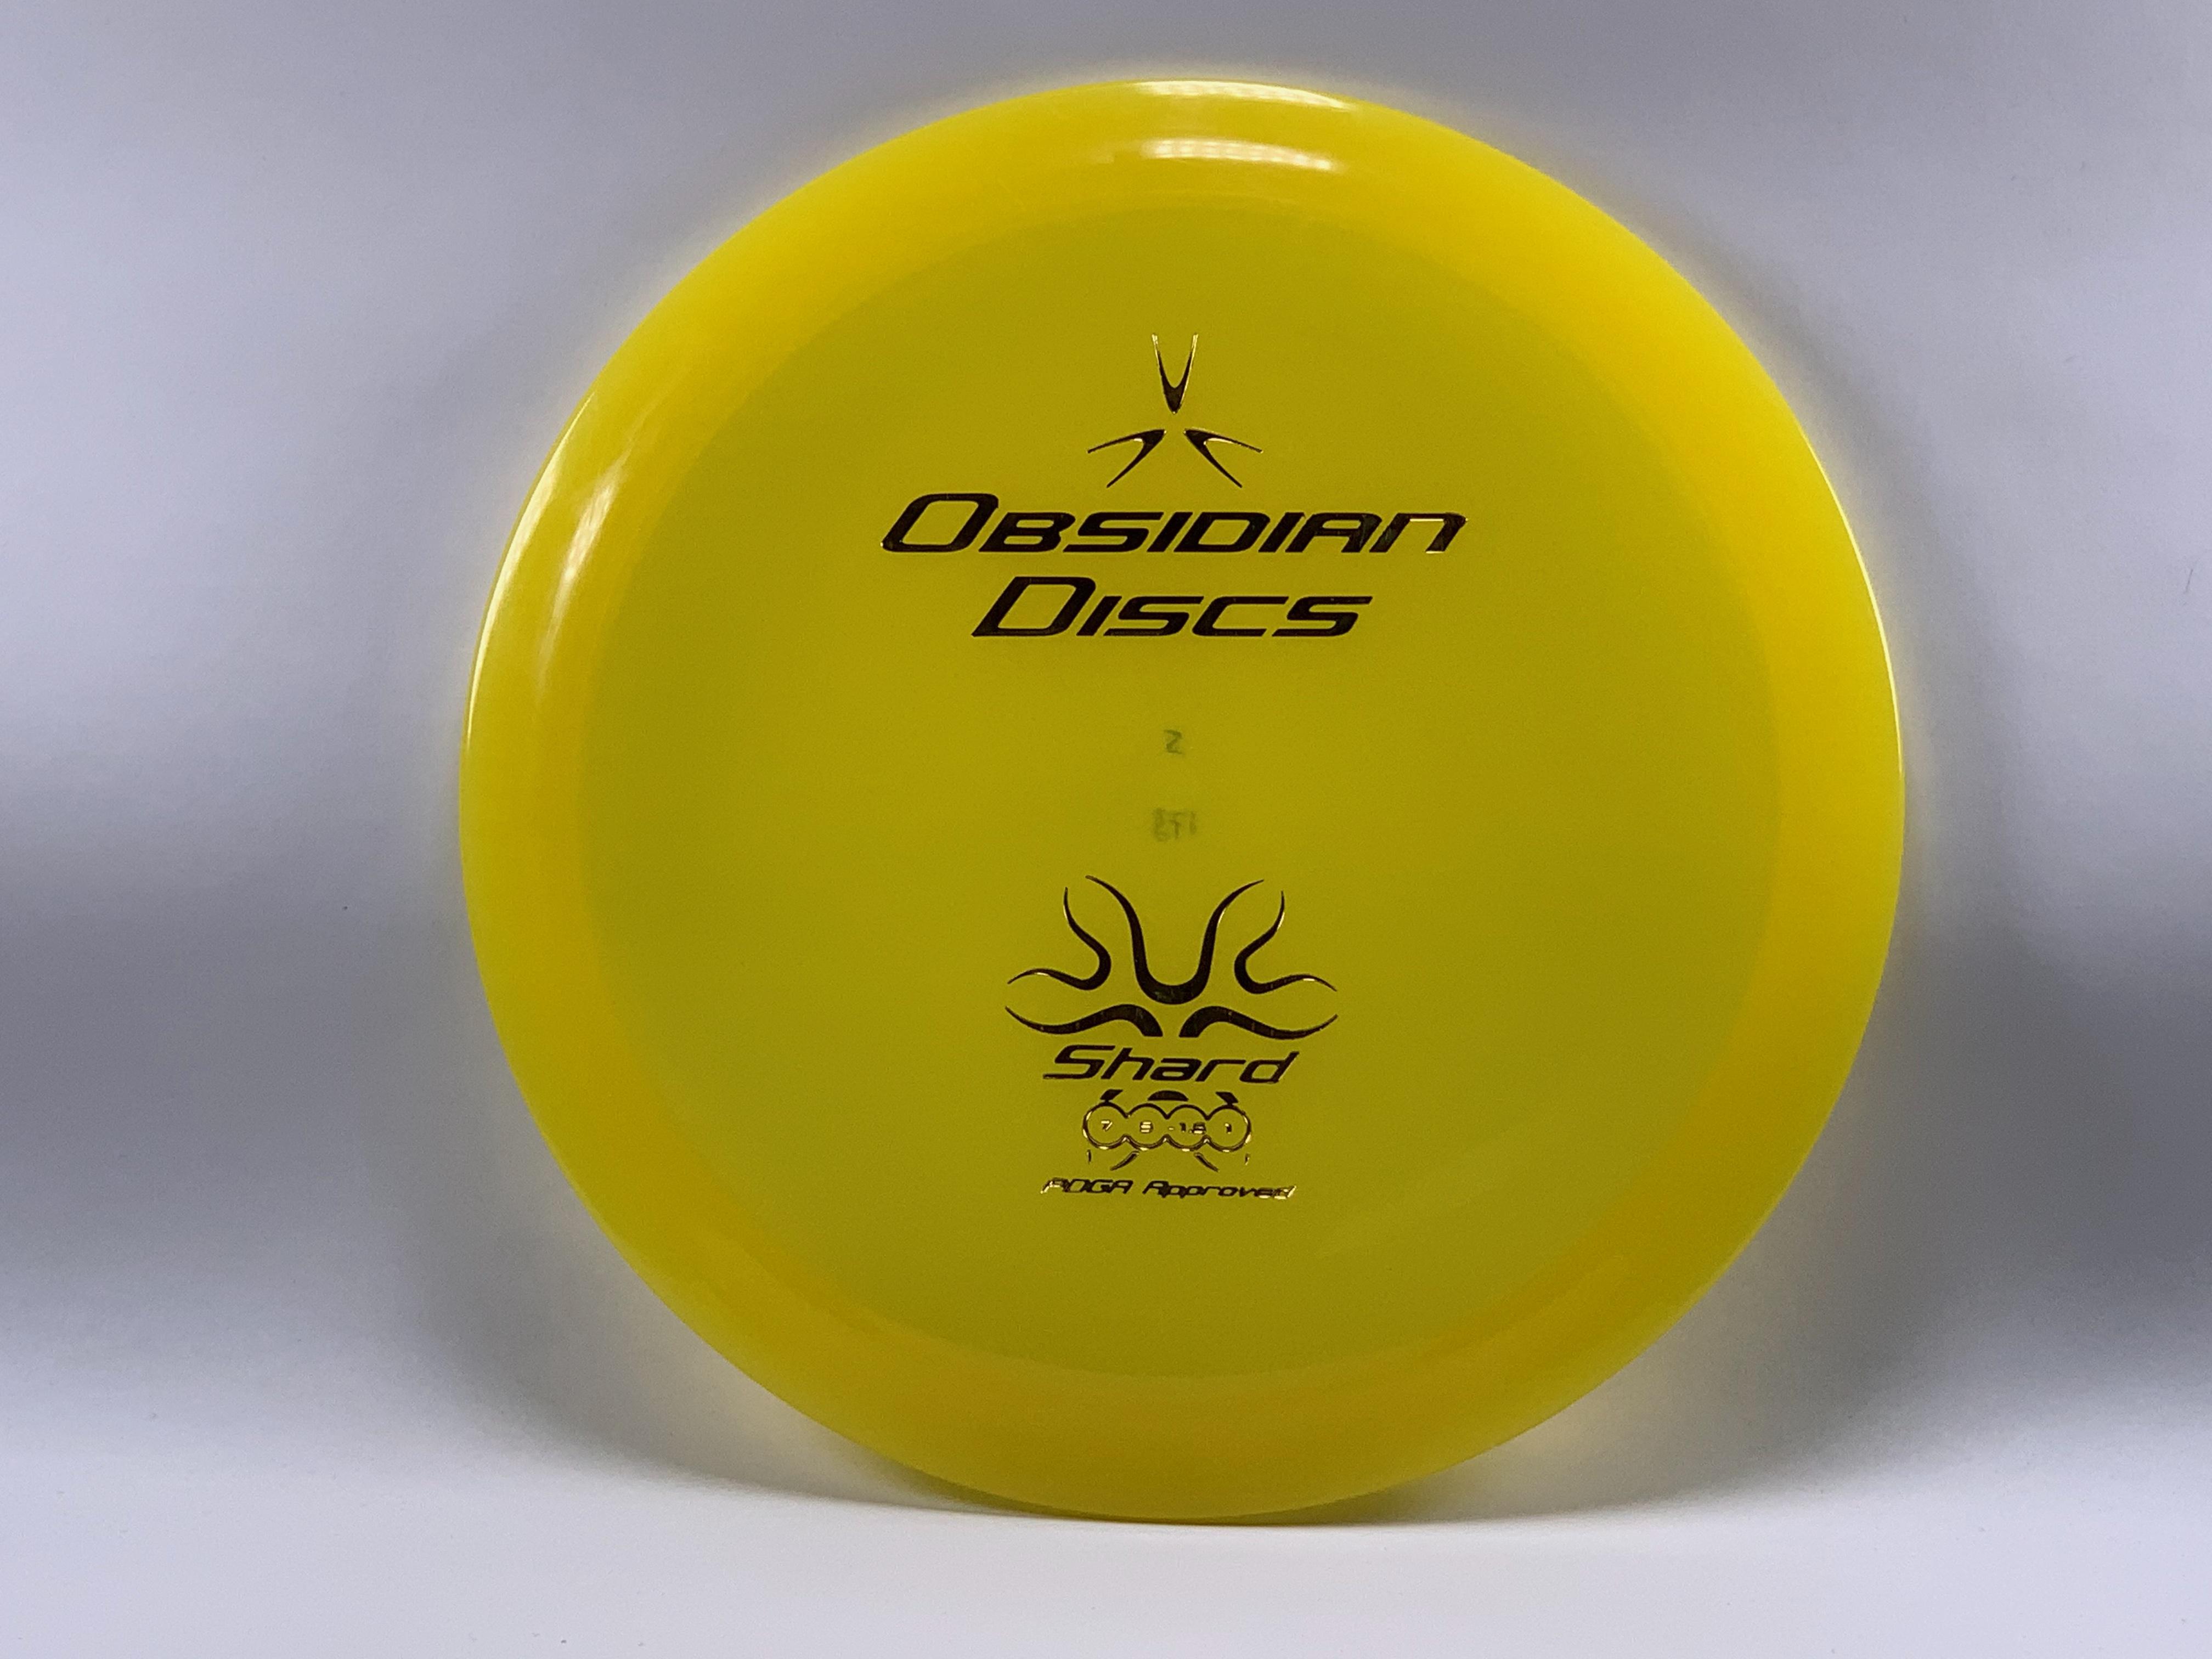 Obsidian Discs Shard